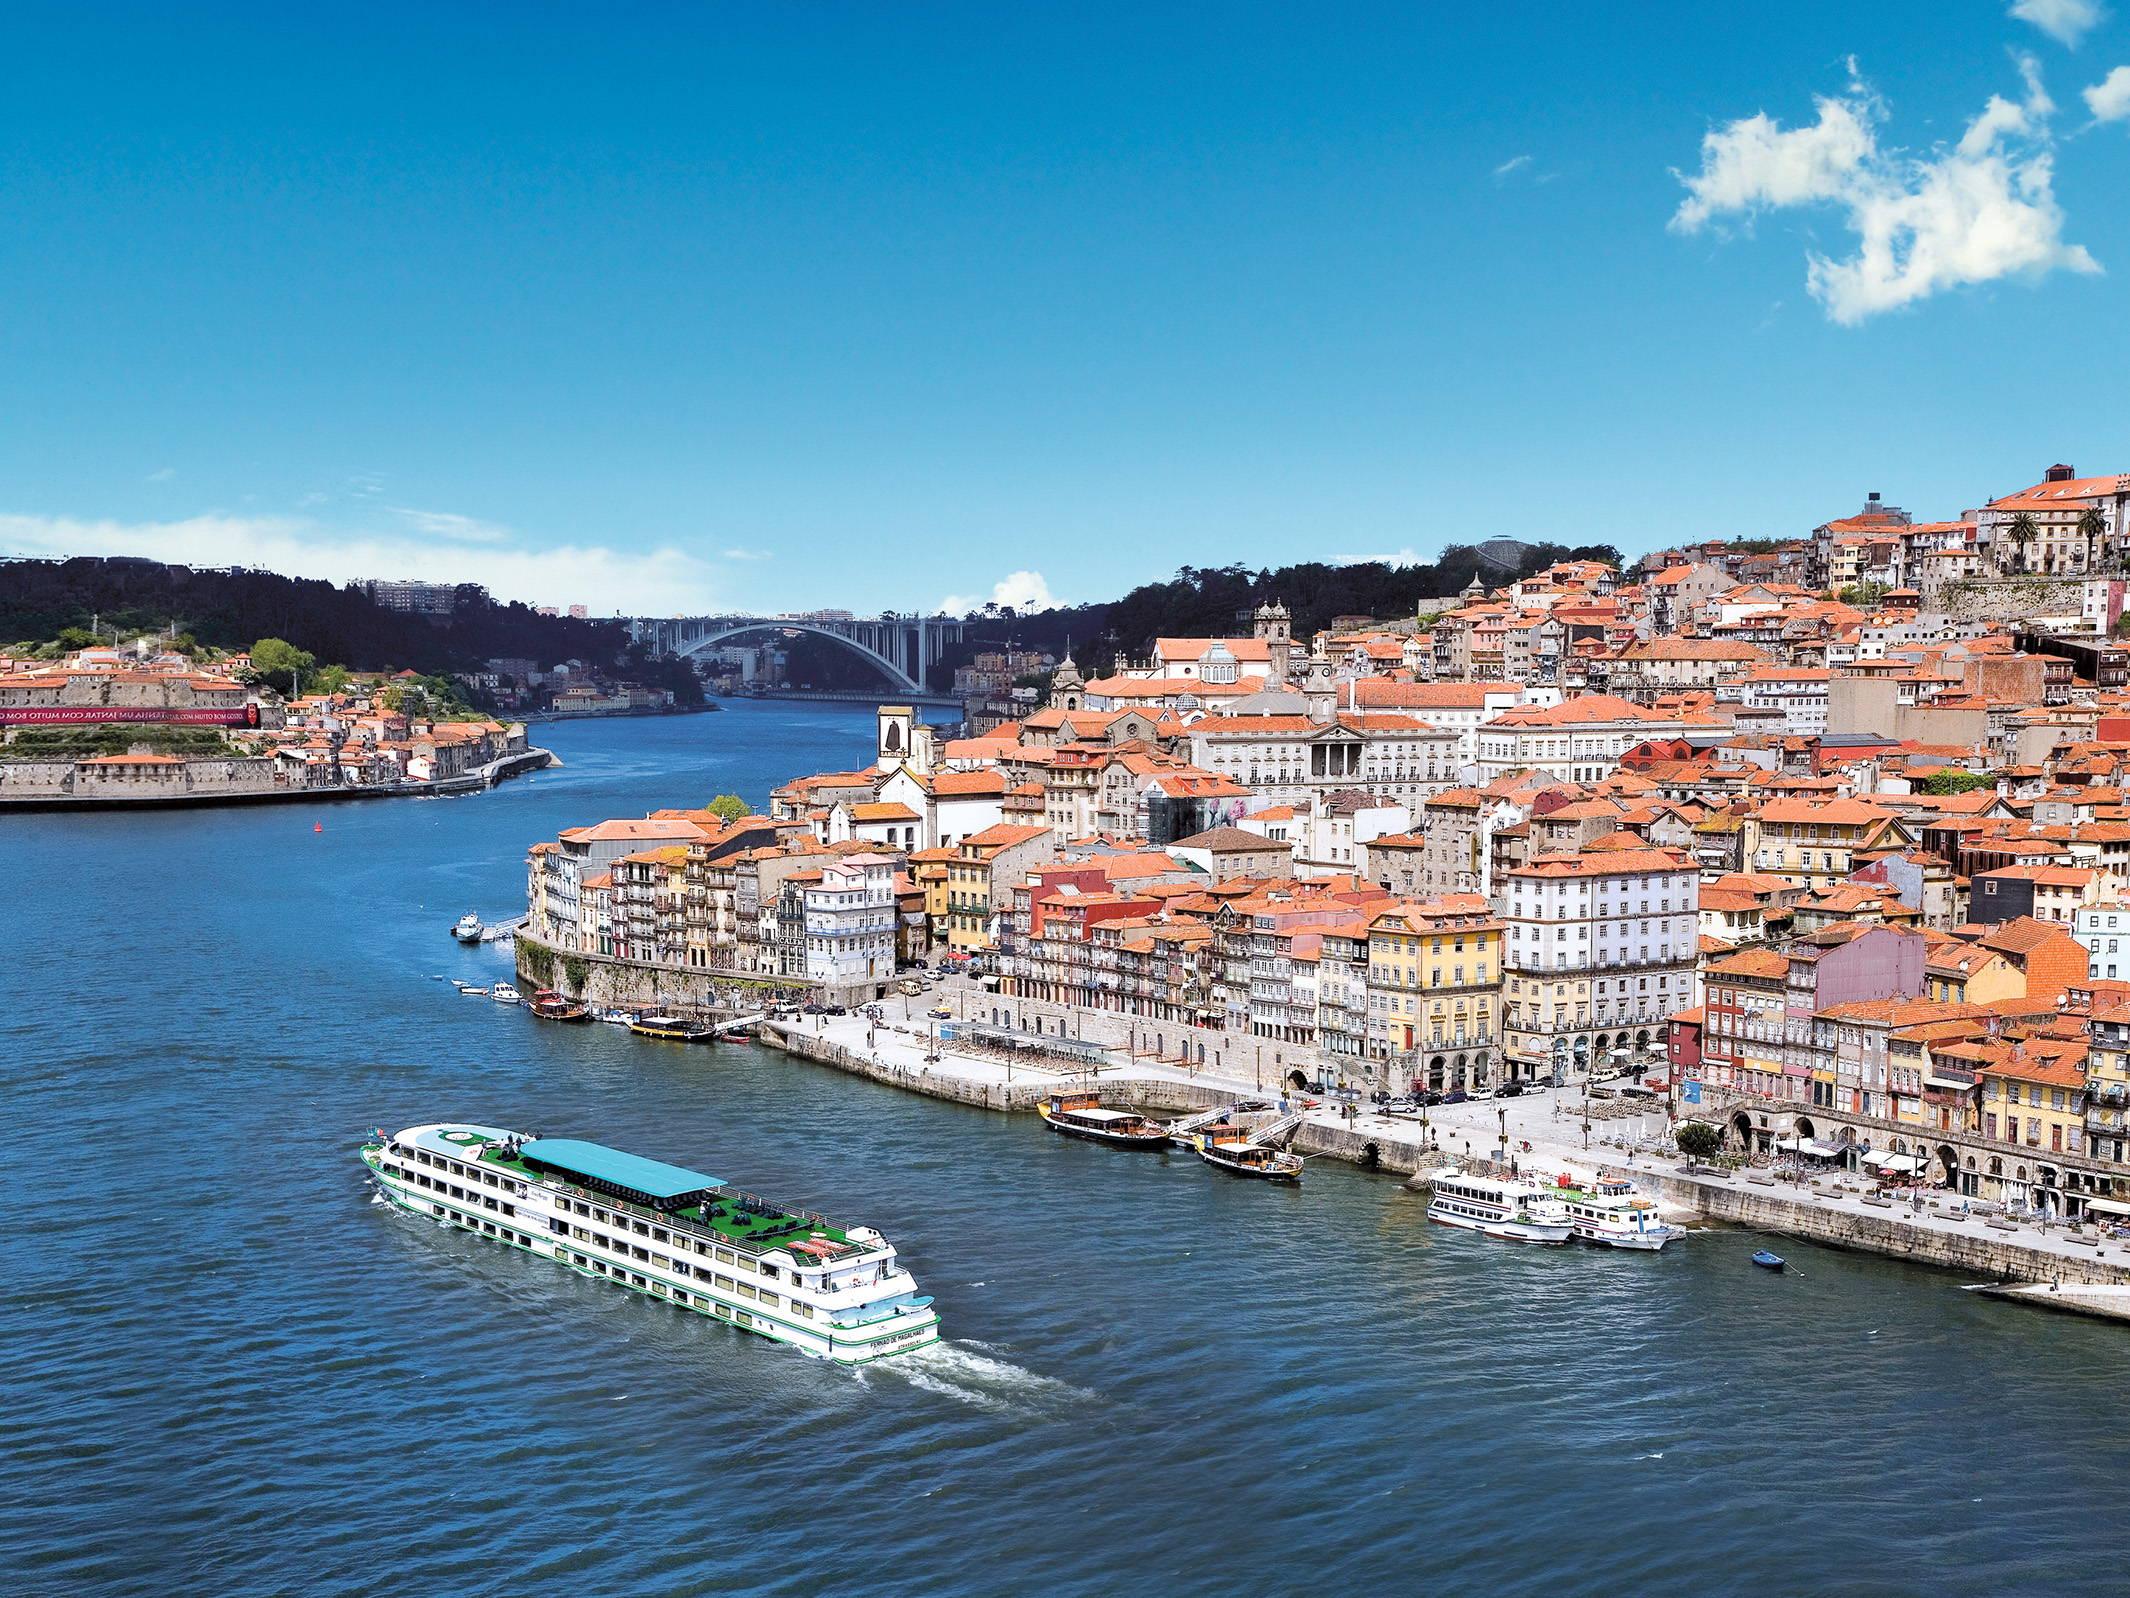 CroisiEurope Portugal Cruise